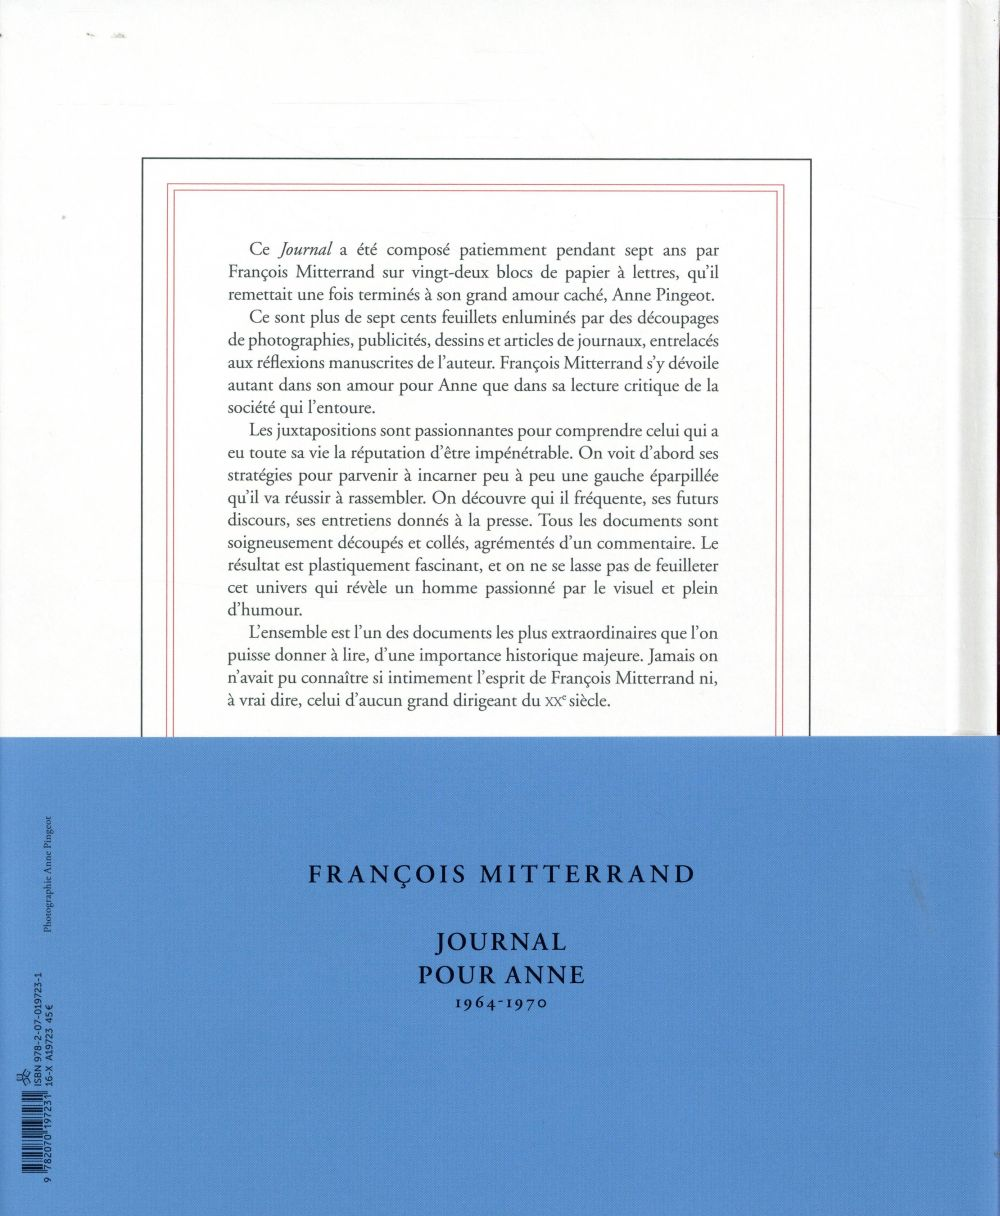 Journal pour Anne ; 1964-1970